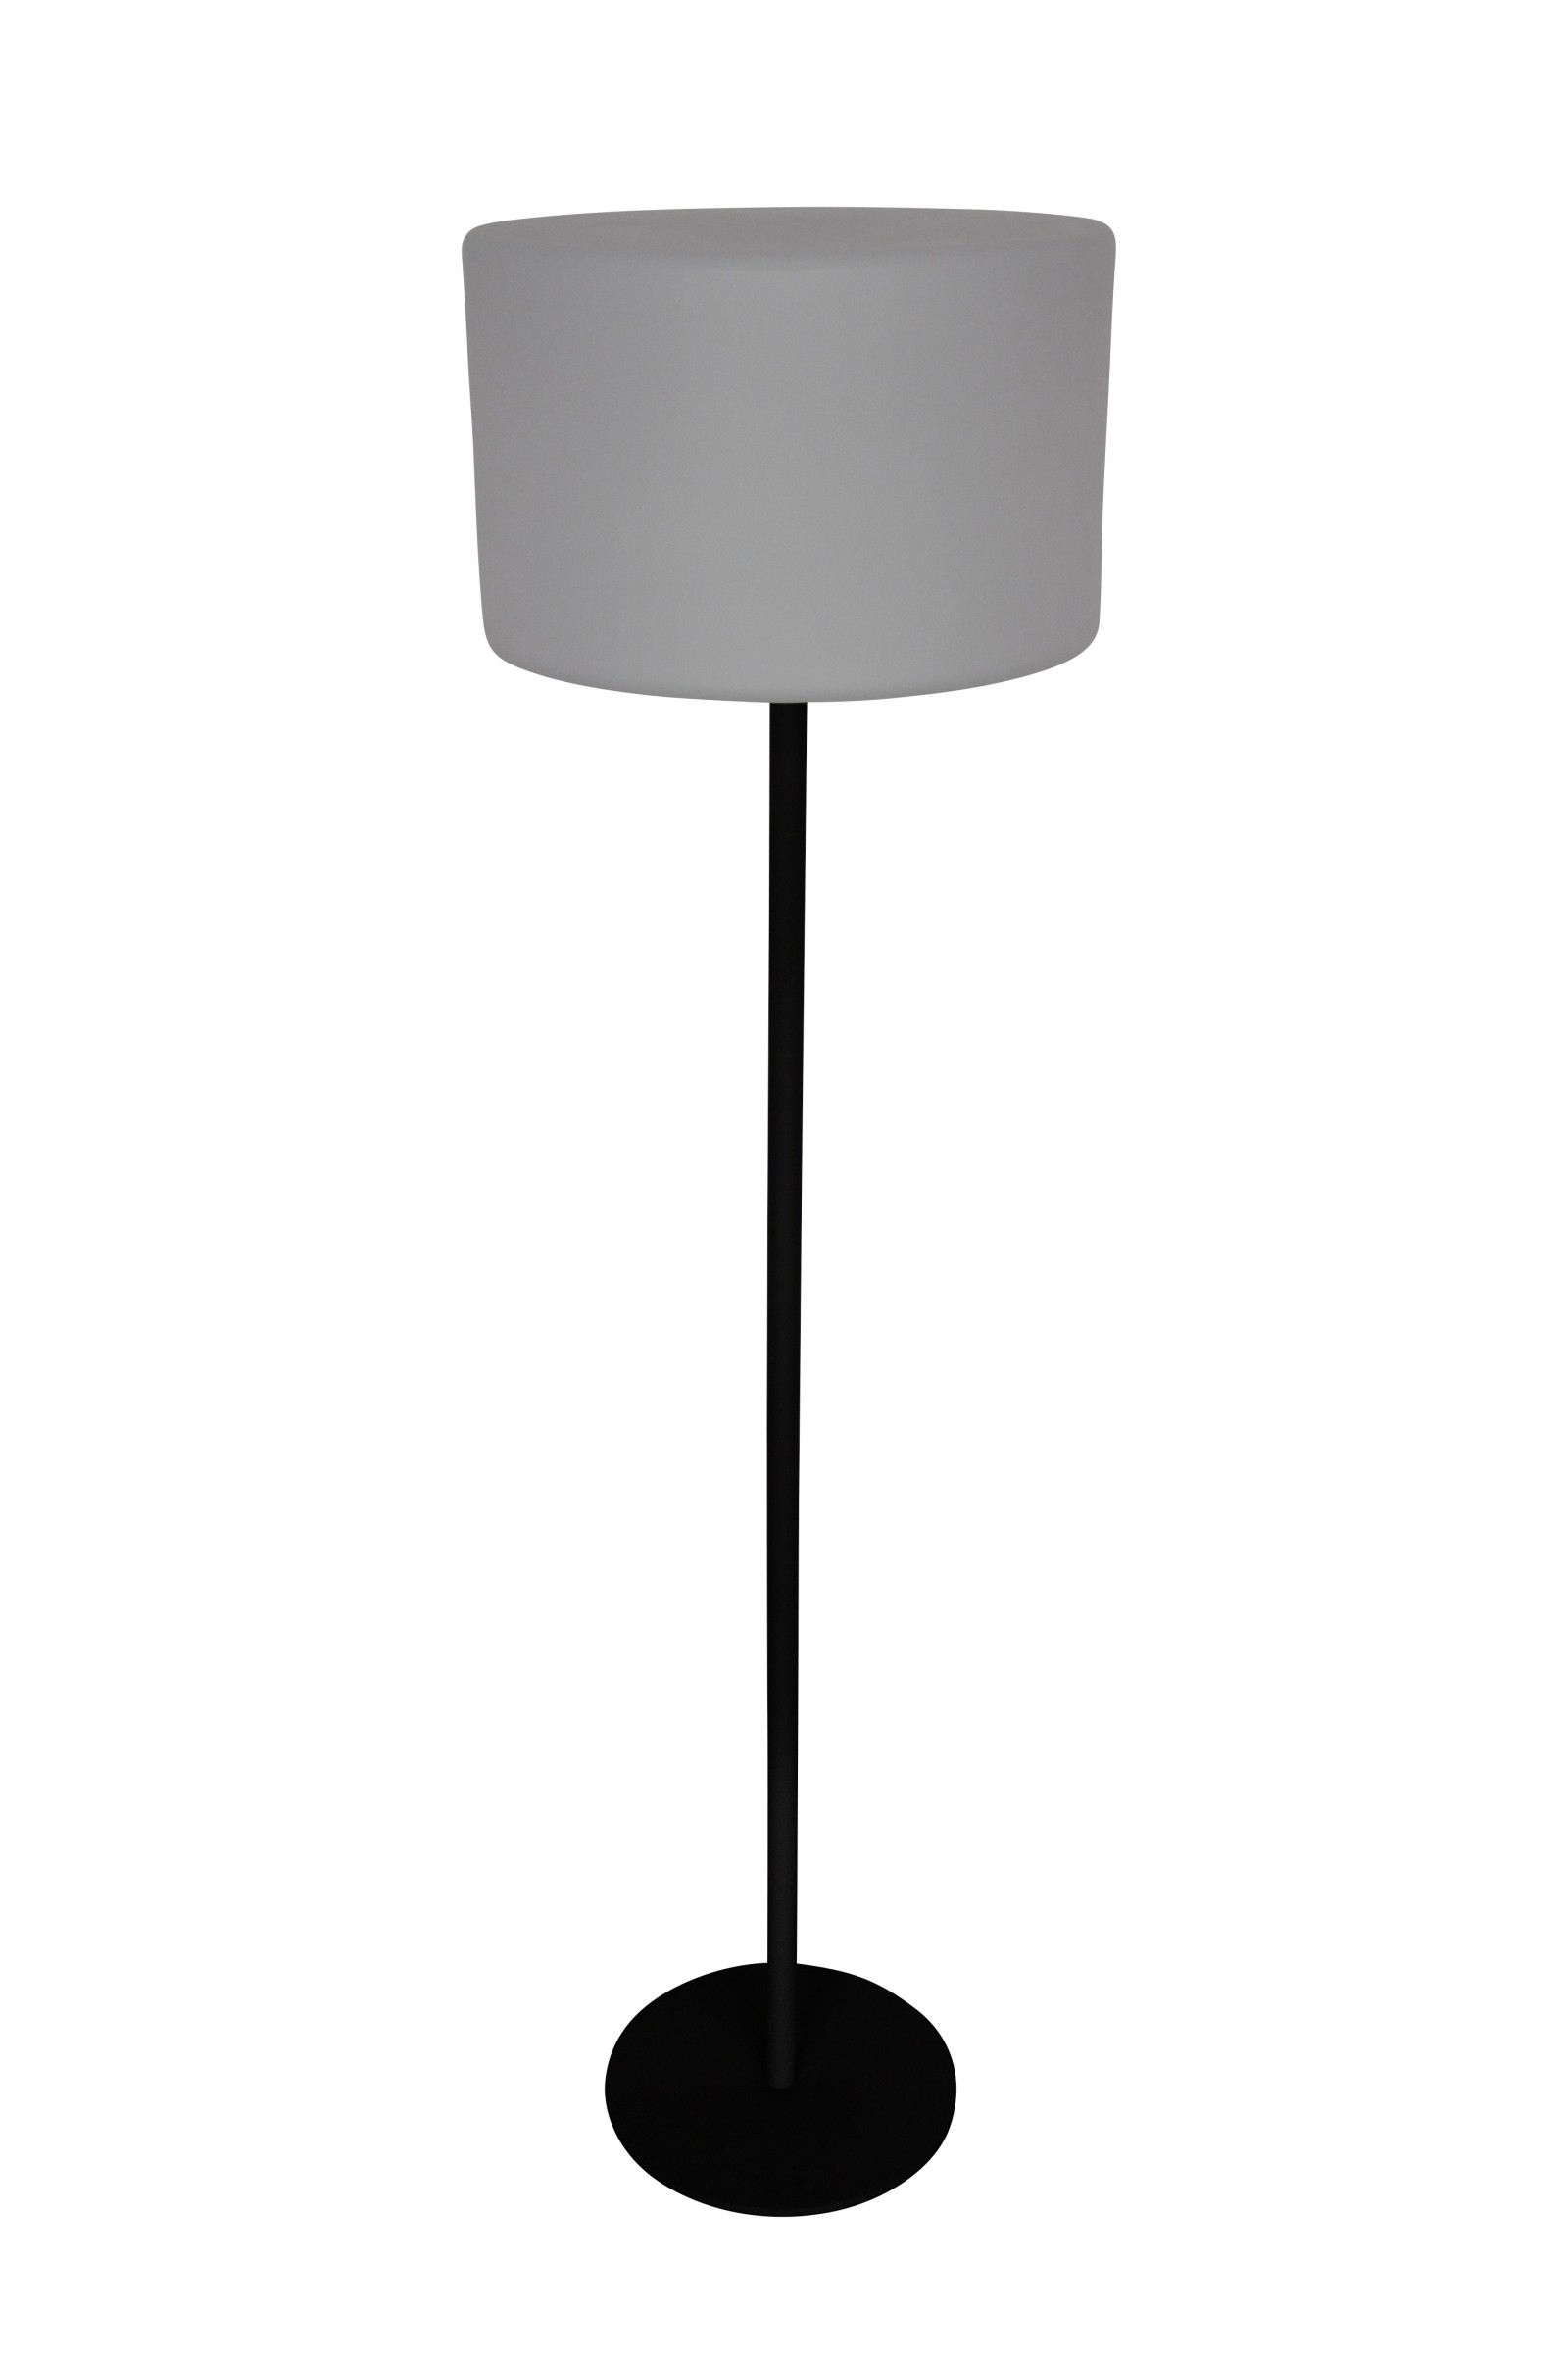 Leco Led Terrassenstehlampe Farbwechsel Stehlampe Garten Lampe